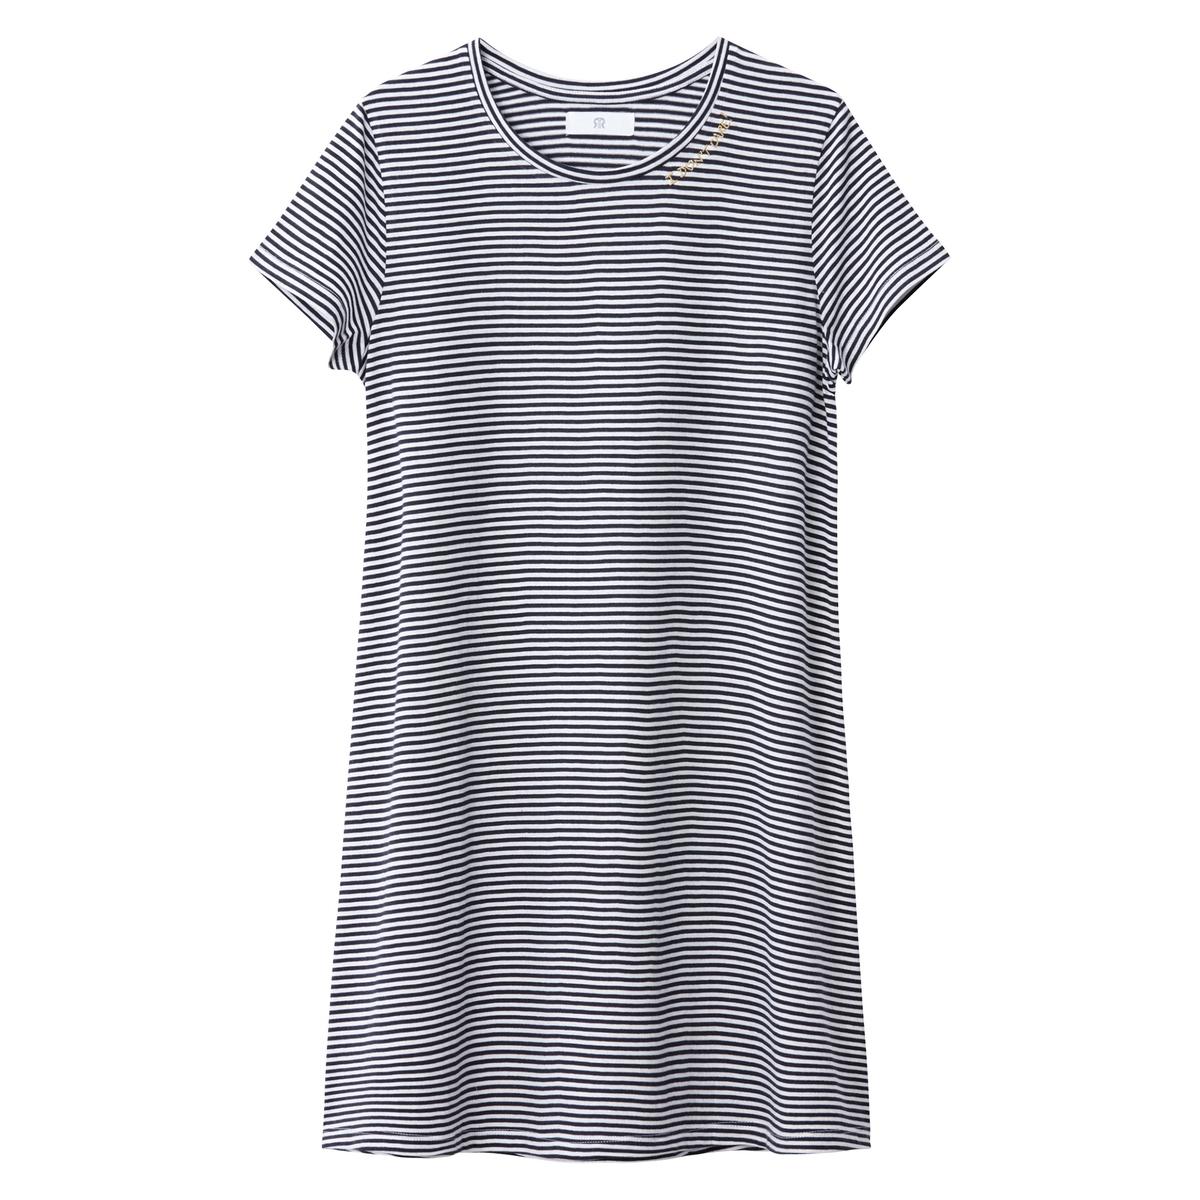 Abito t-shirt a righe 10-16 anni